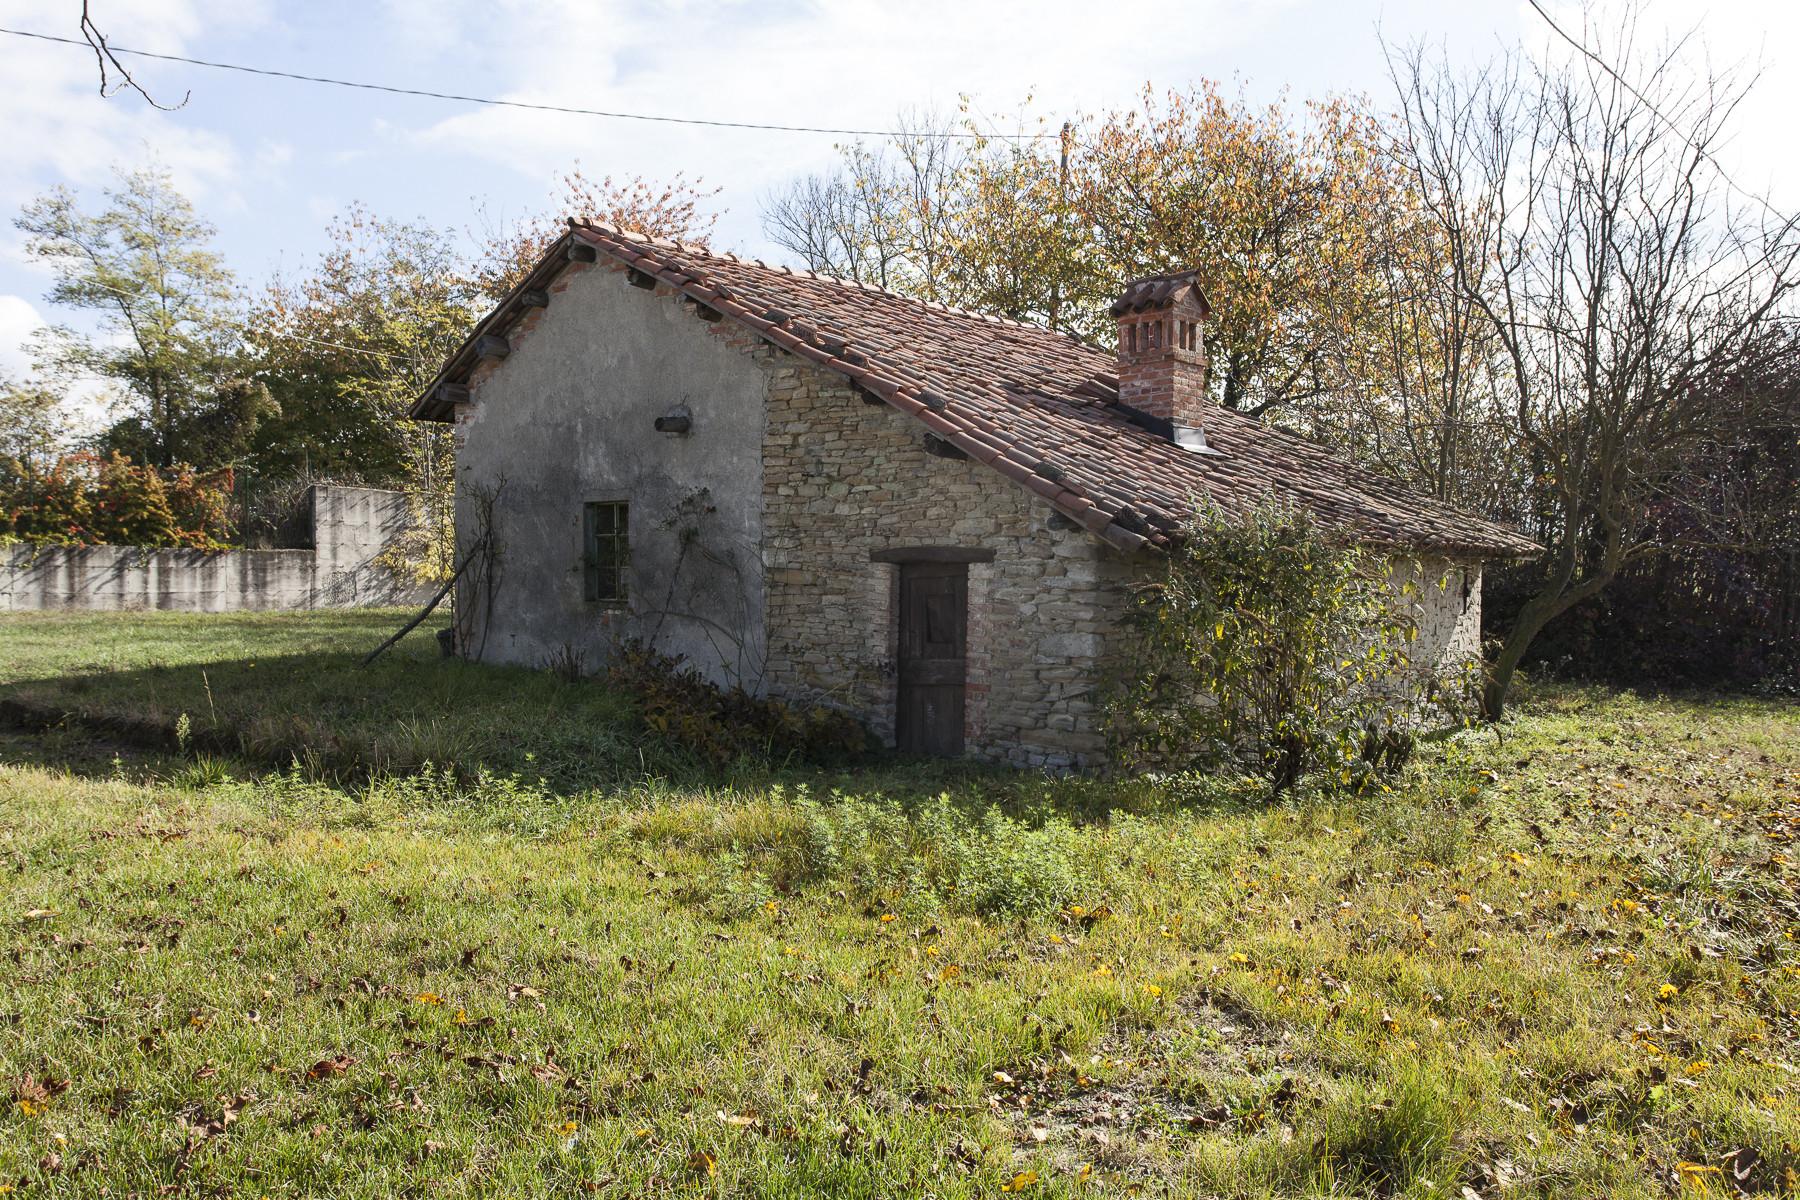 Villa in Vendita a Clavesana: 5 locali, 1130 mq - Foto 9